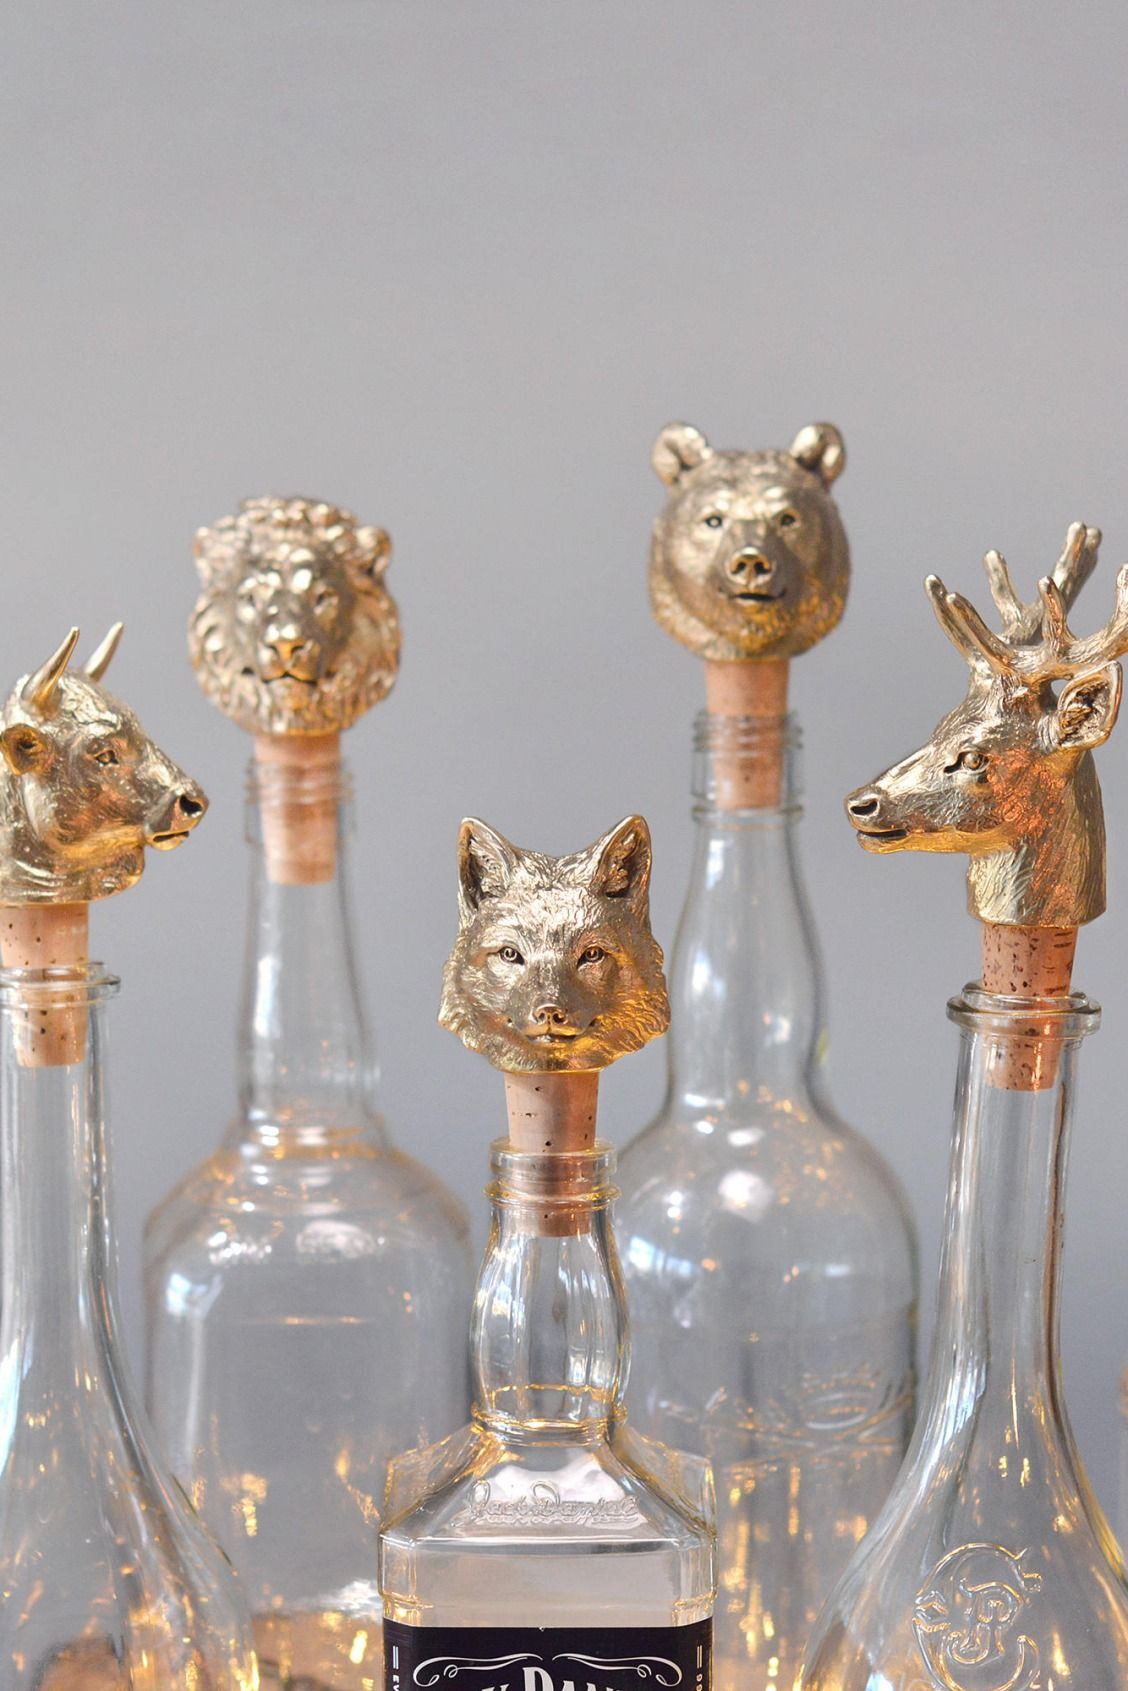 Bottle Stopper Fox Diy Art Upcycled Crafts Diy Decor